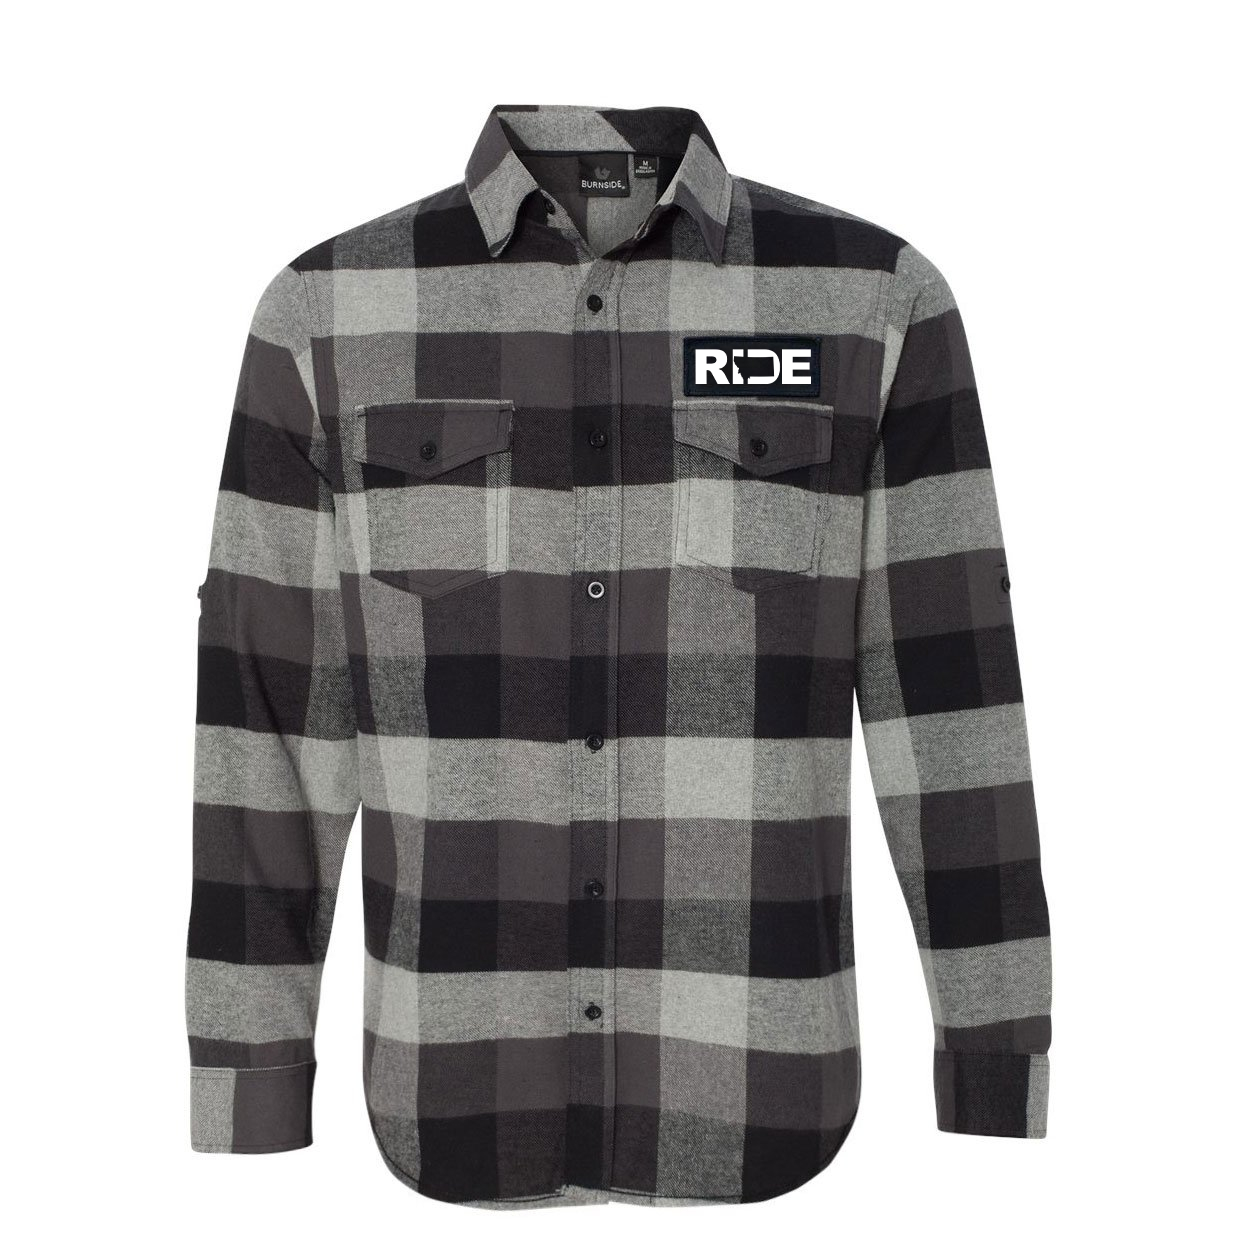 Ride Montana Classic Unisex Long Sleeve Woven Patch Flannel Shirt Black/Gray (White Logo)